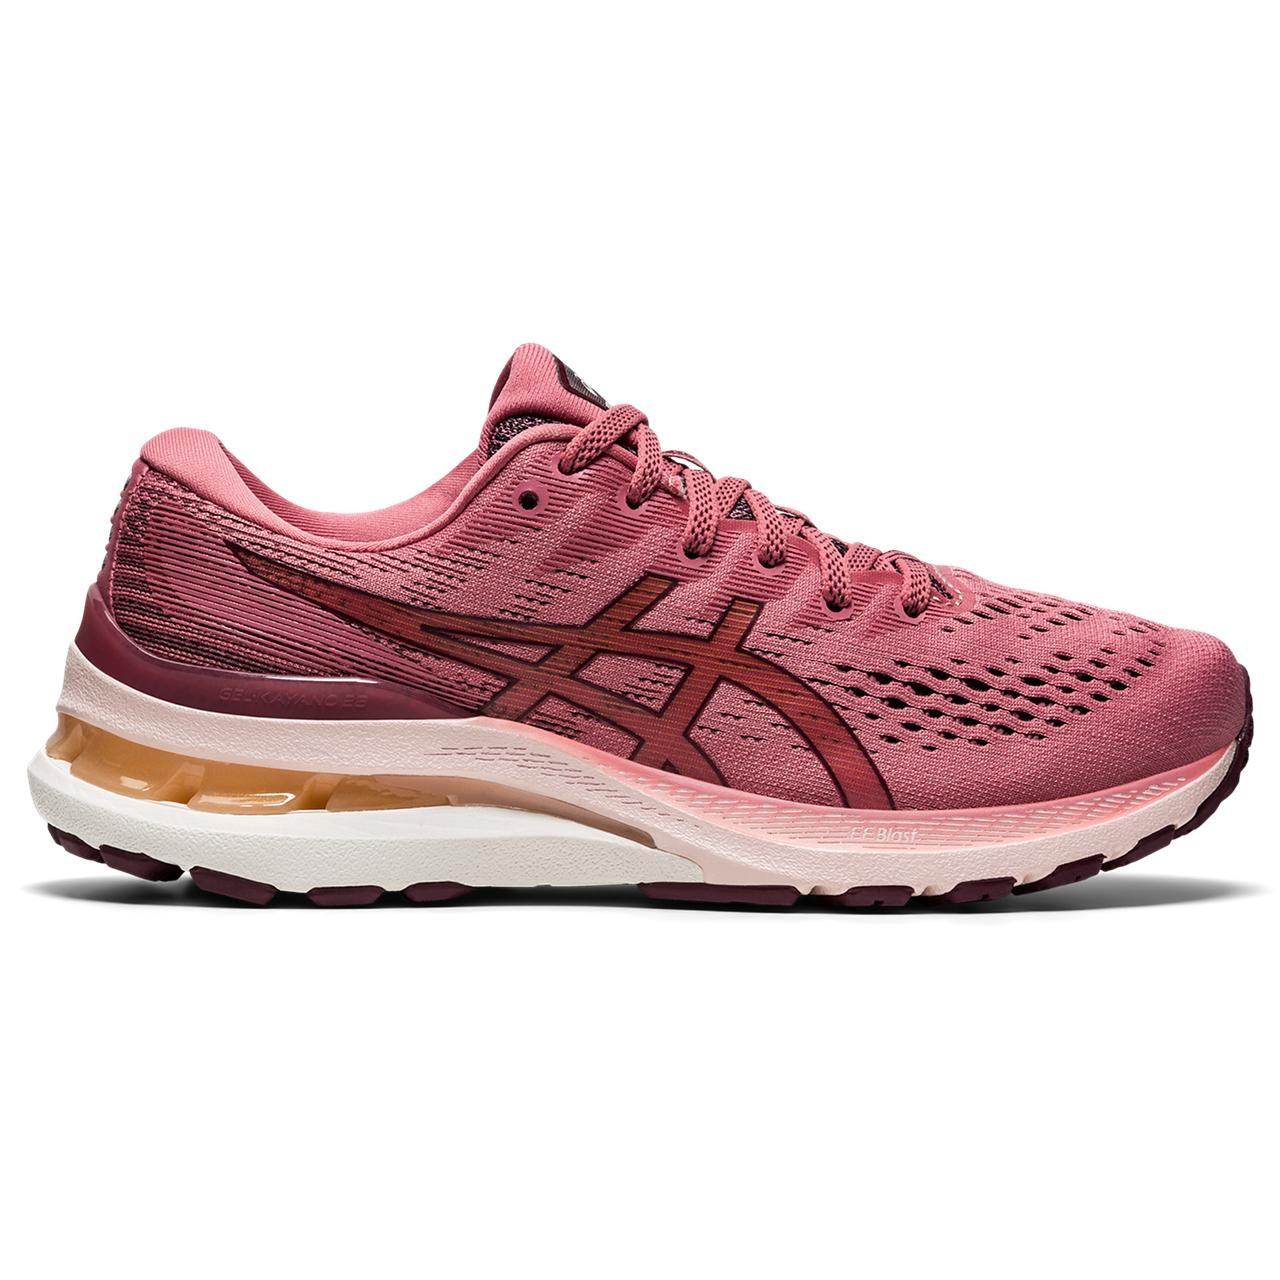 Produktbild von asics Gel-Kayano 28 Damen Laufschuh - smokey rose/deep mars